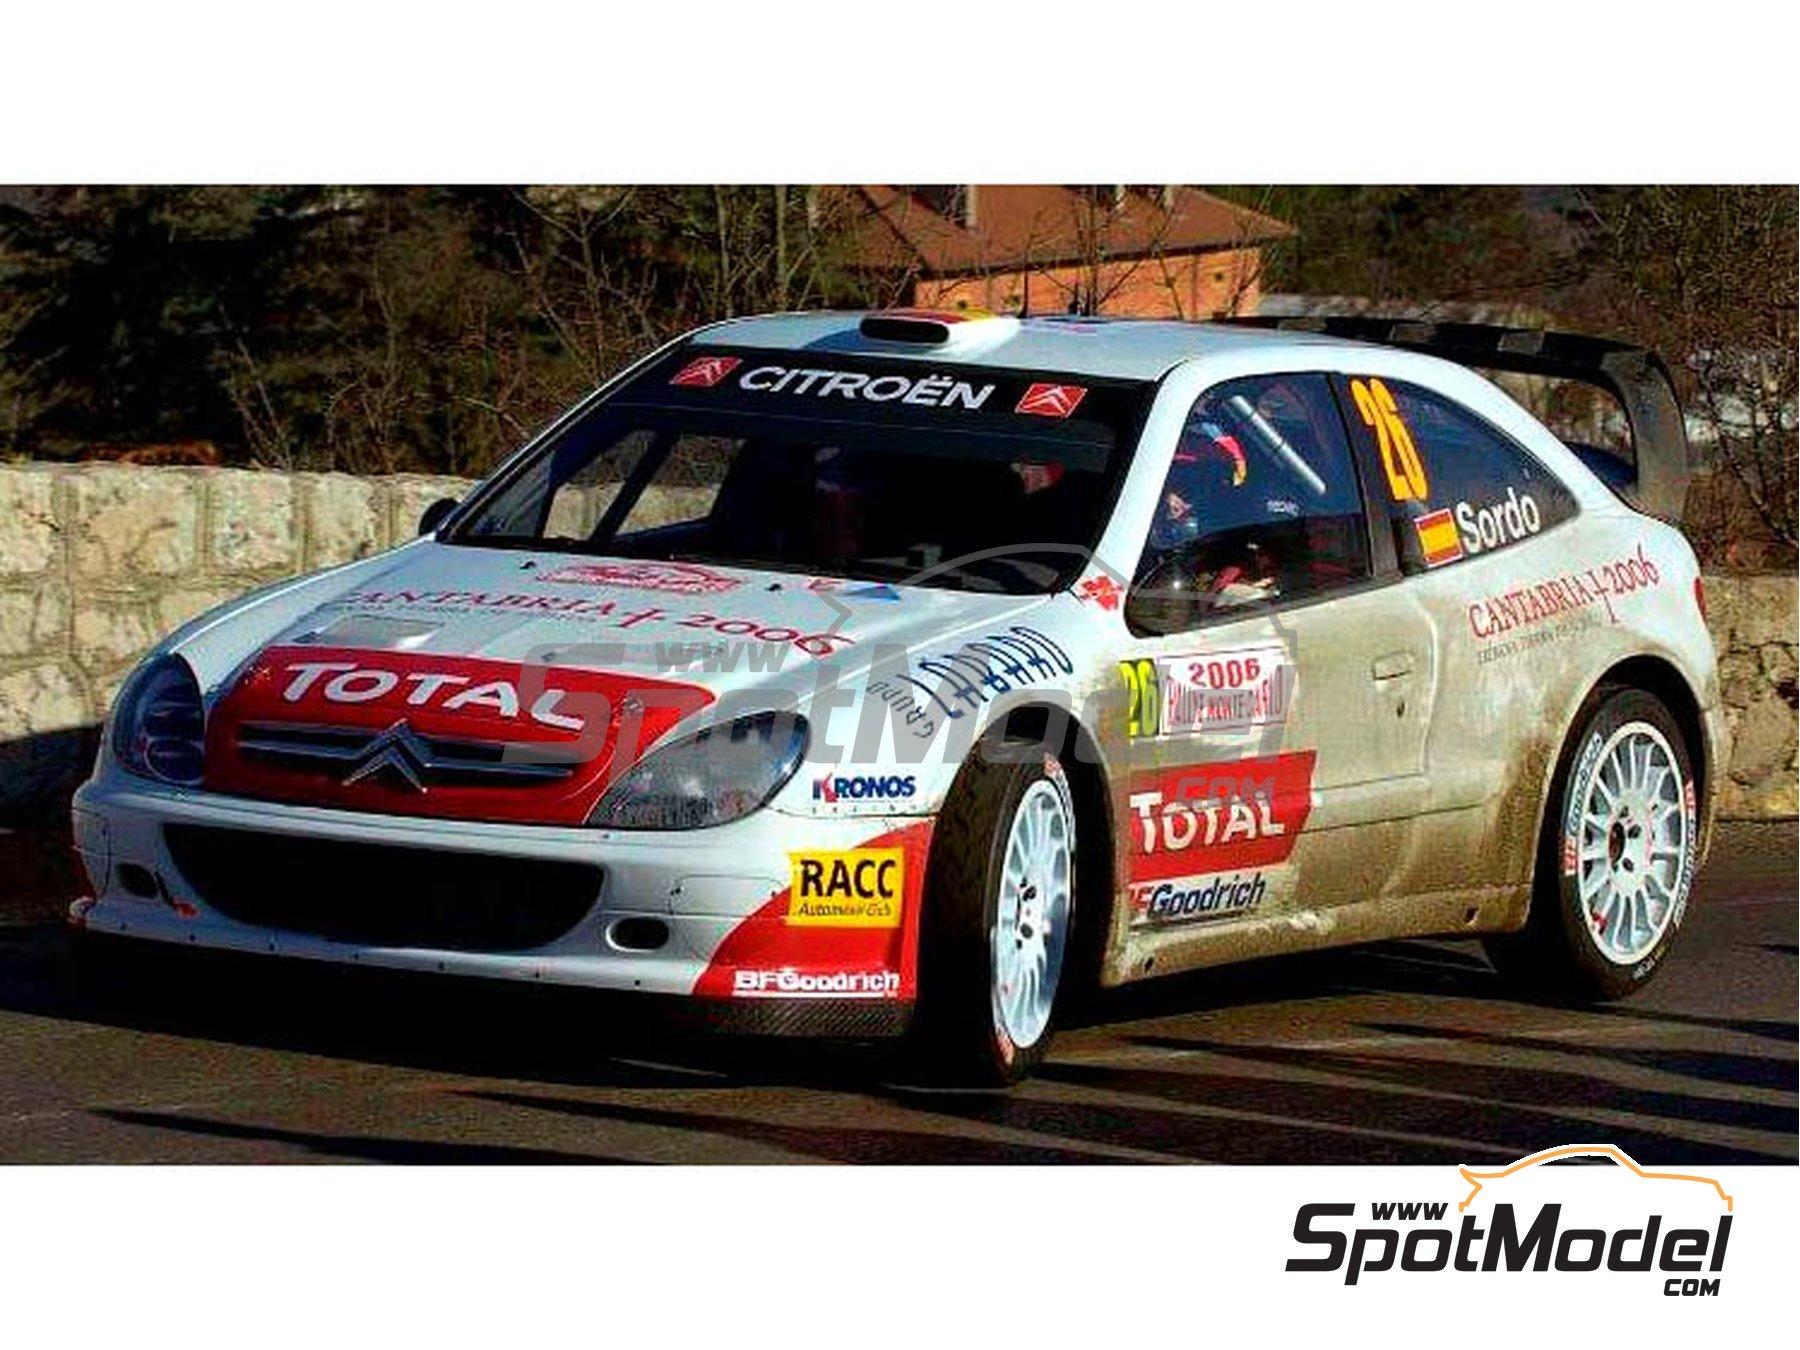 Image 3: Citroen Xsara WRC Kronos - Montecarlo Rally, Svezia Sweden Rally 2006 | Marking / livery in 1/24 scale manufactured by Reji Model (ref.REJI-102)